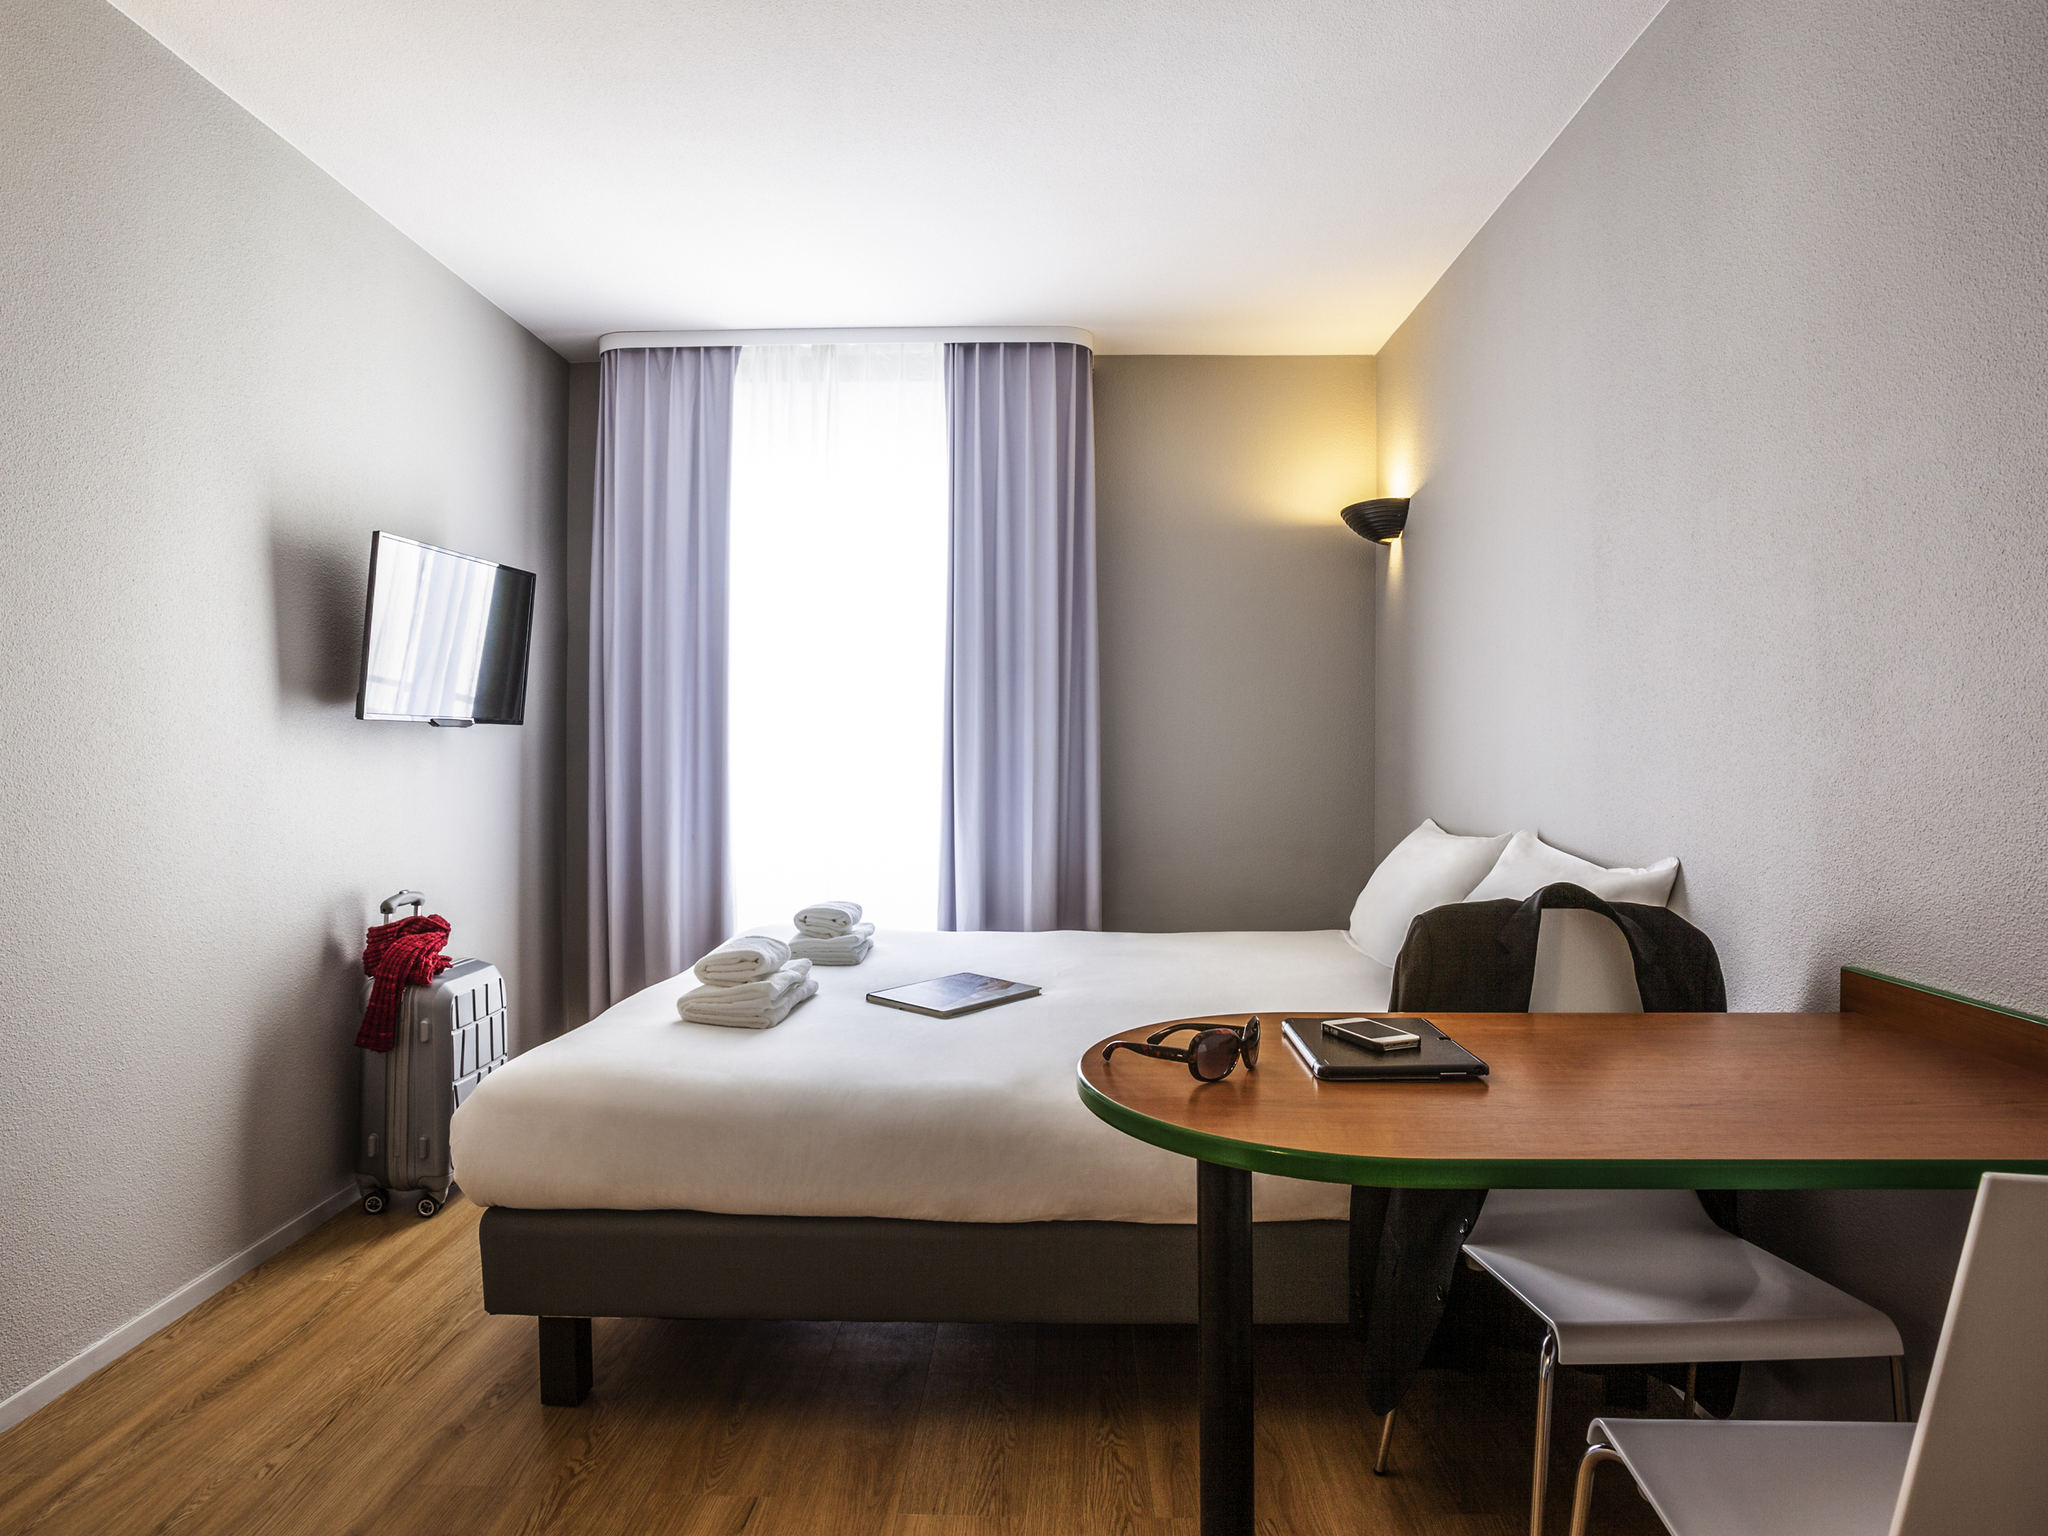 فندق - Aparthotel Adagio access Paris Maisons-Alfort